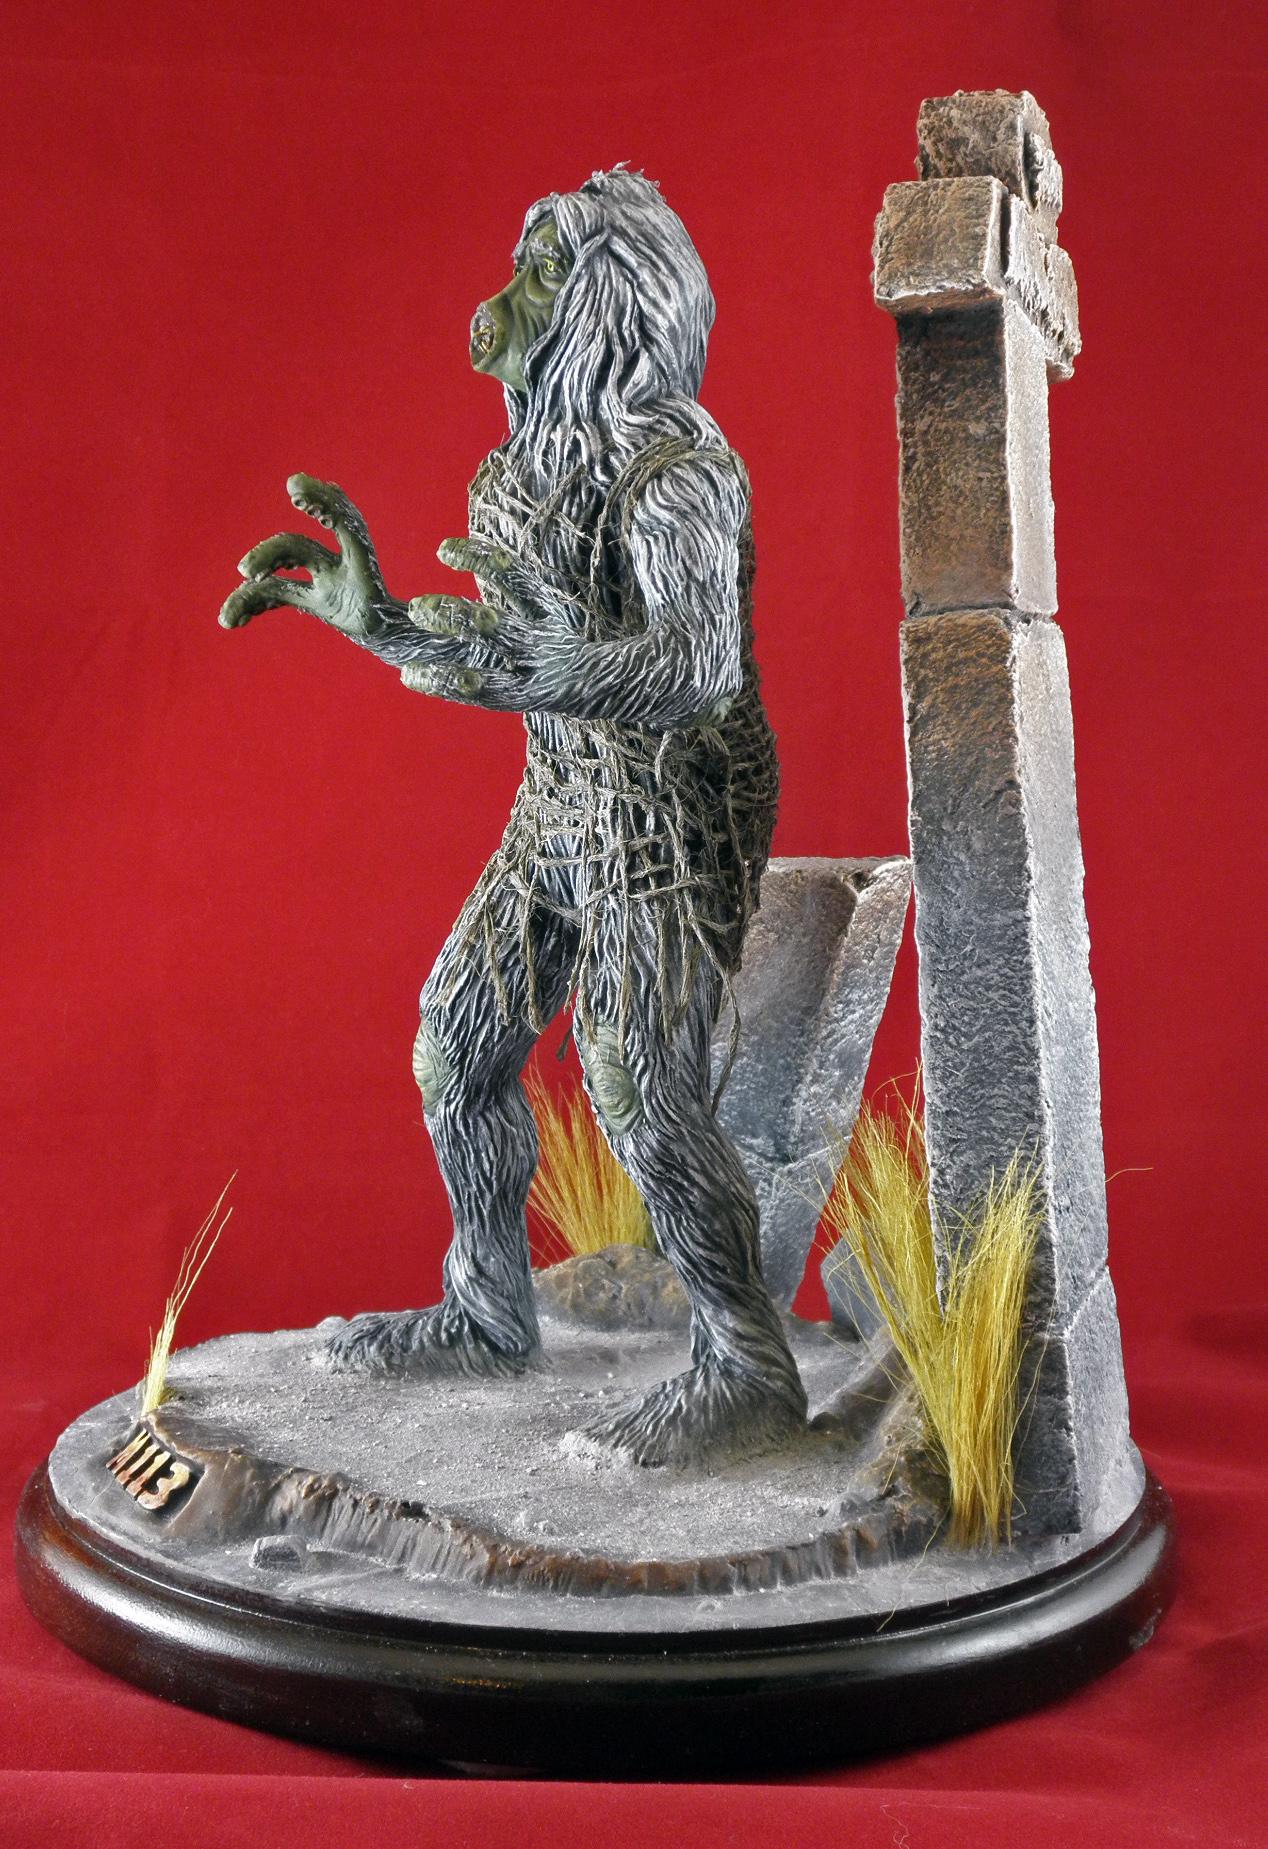 Salt Creature, Left Side